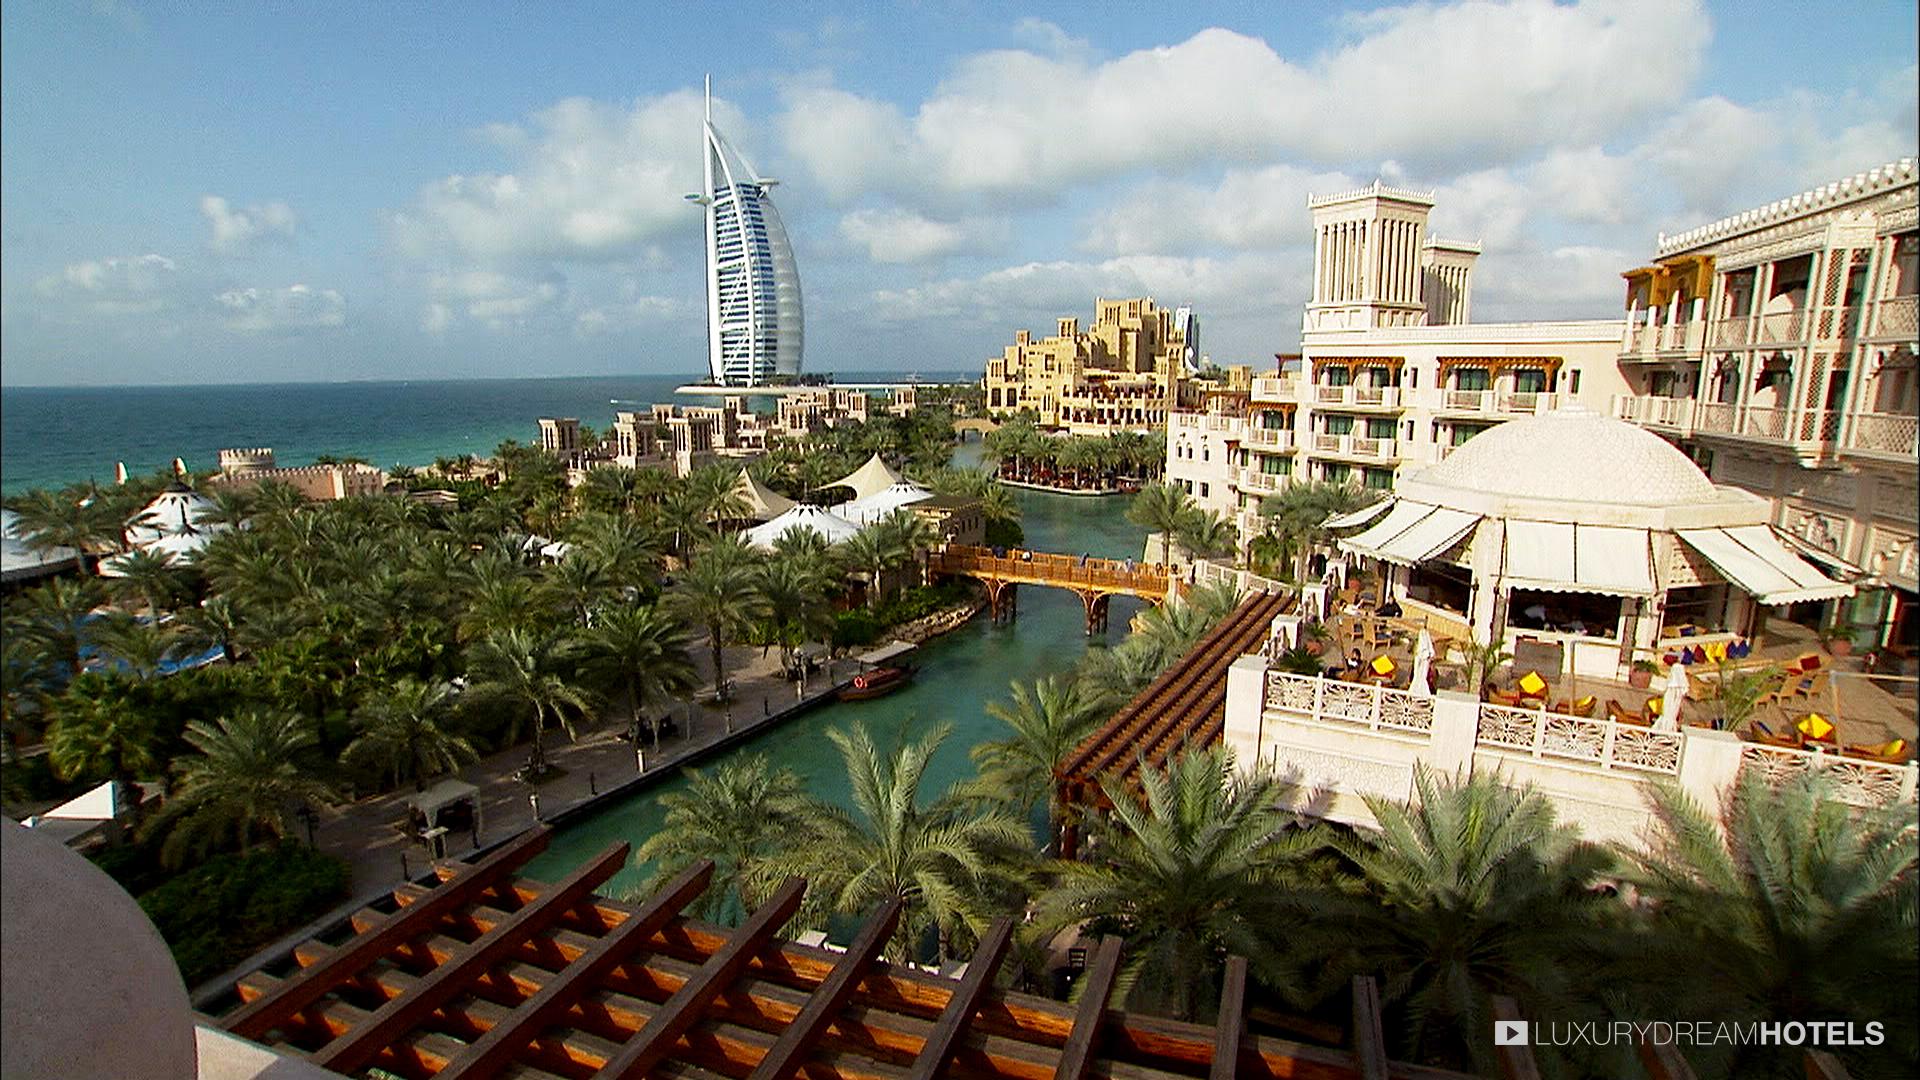 madinat-jumeirah-luxury-dream-hotels-4